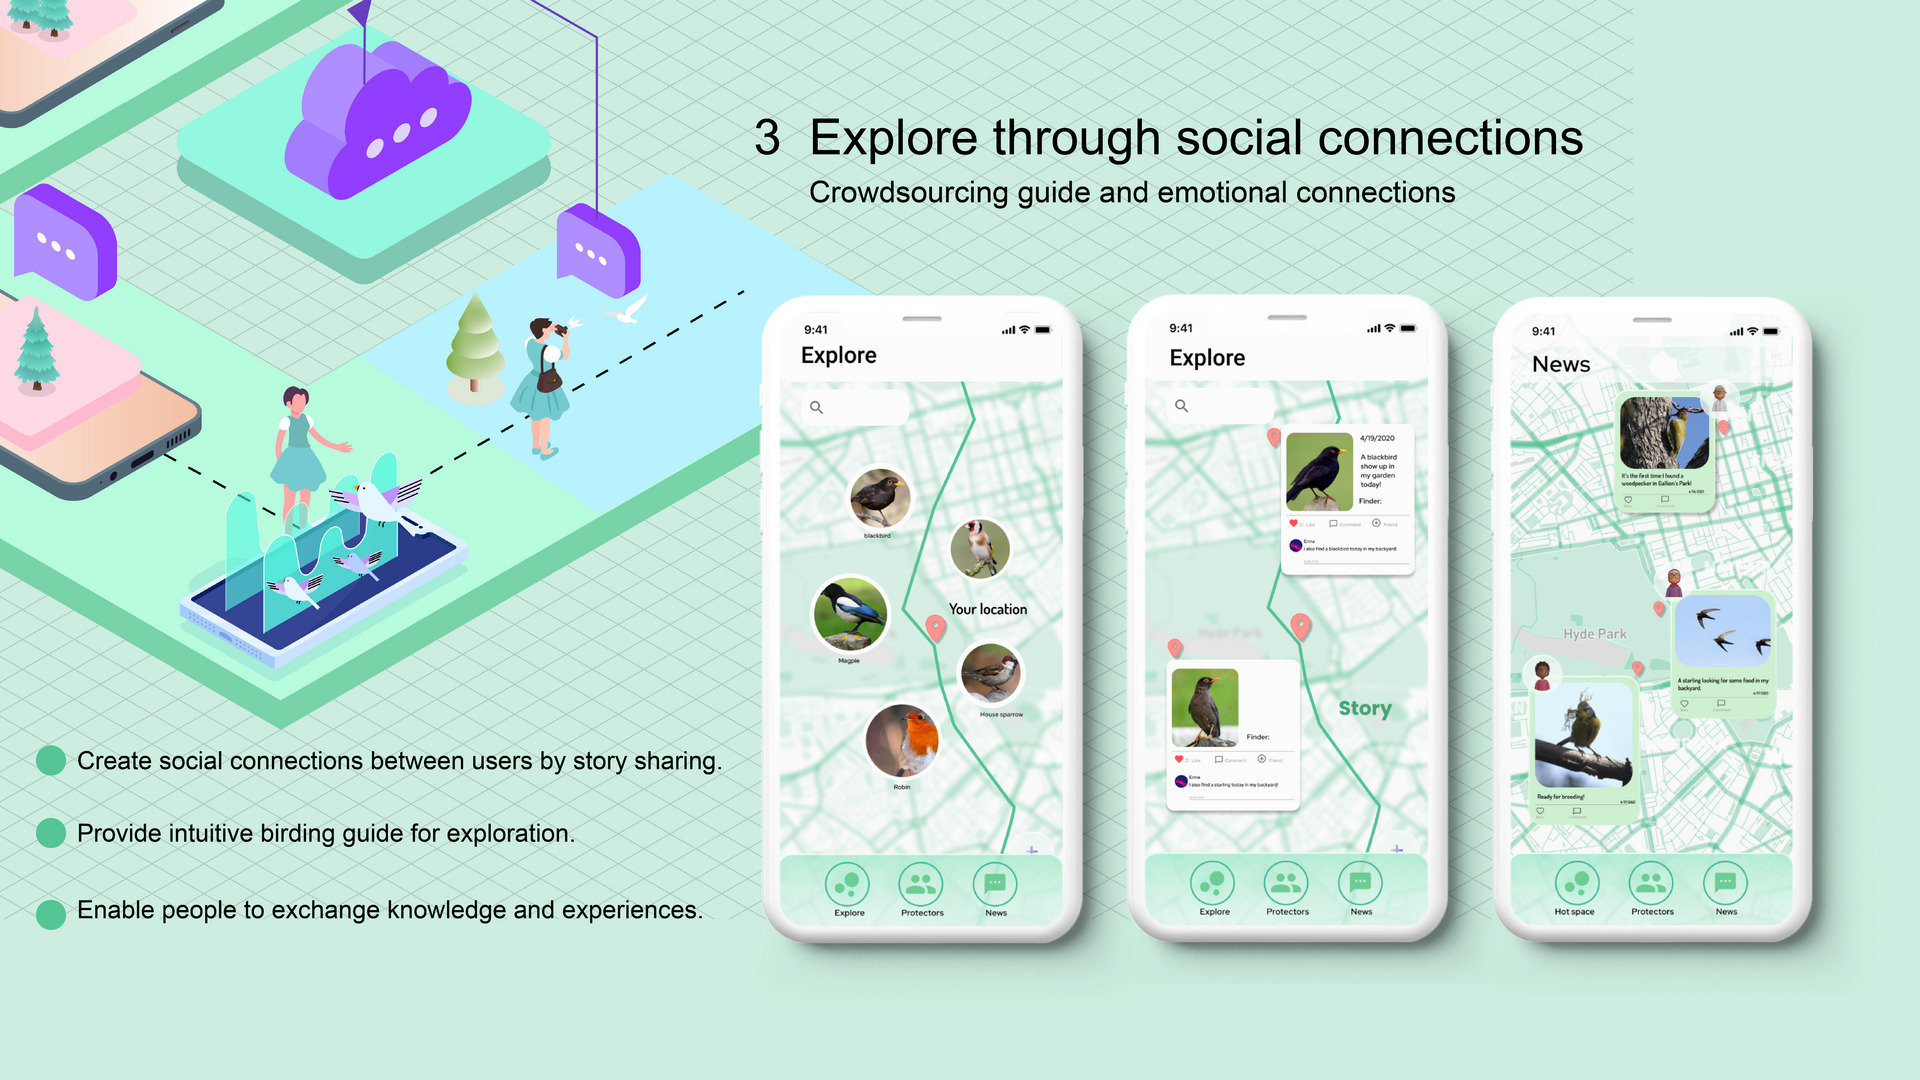 Step3: Explore through social connections